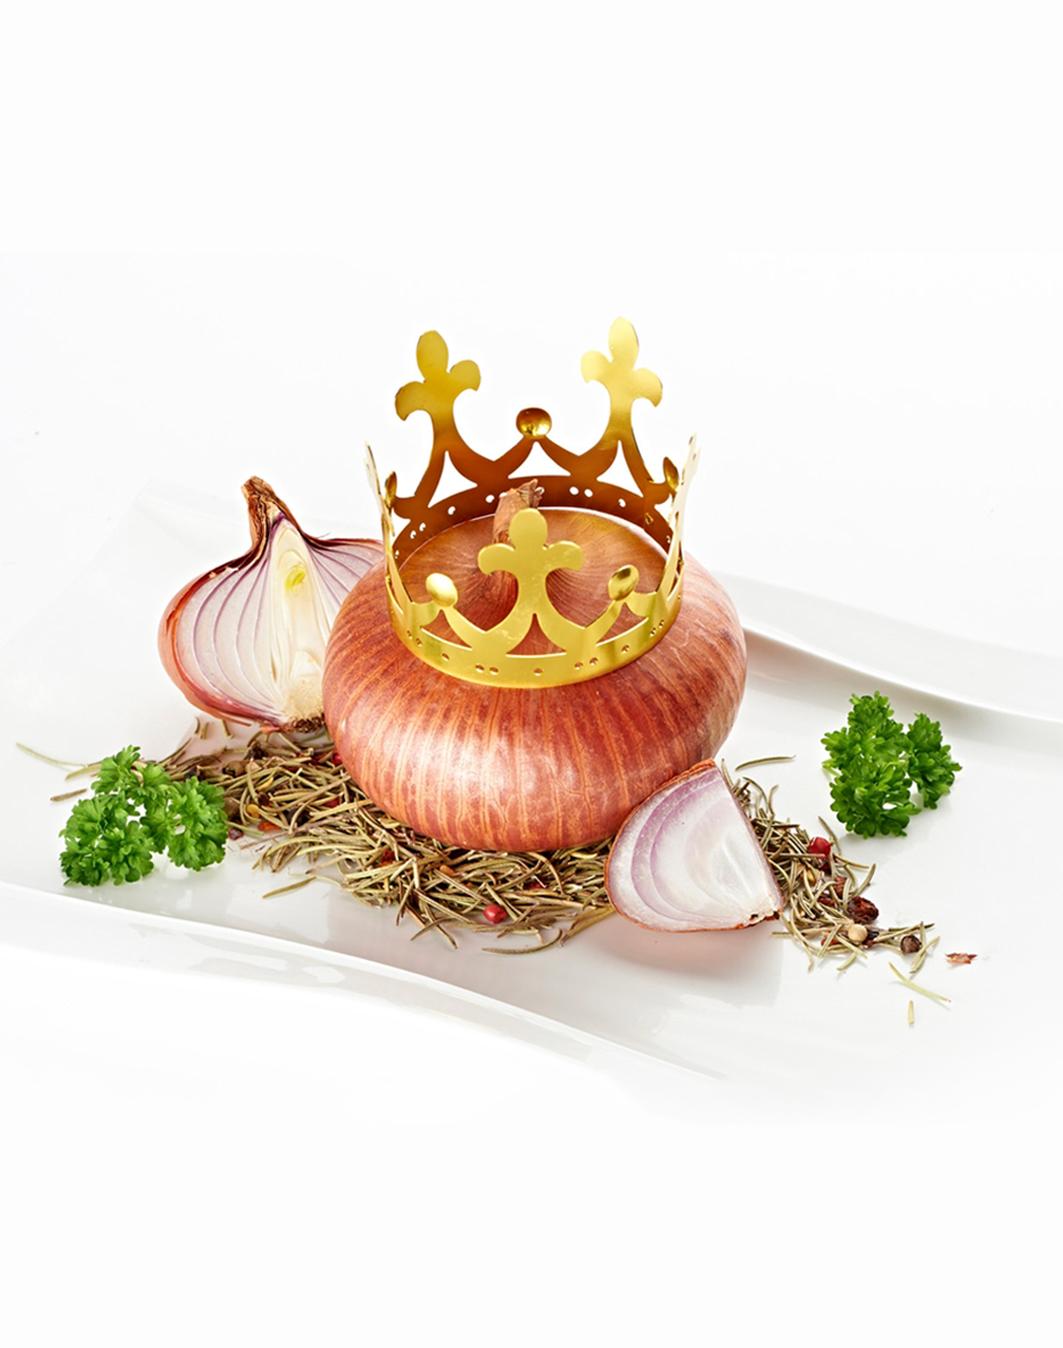 Kralj-cebul